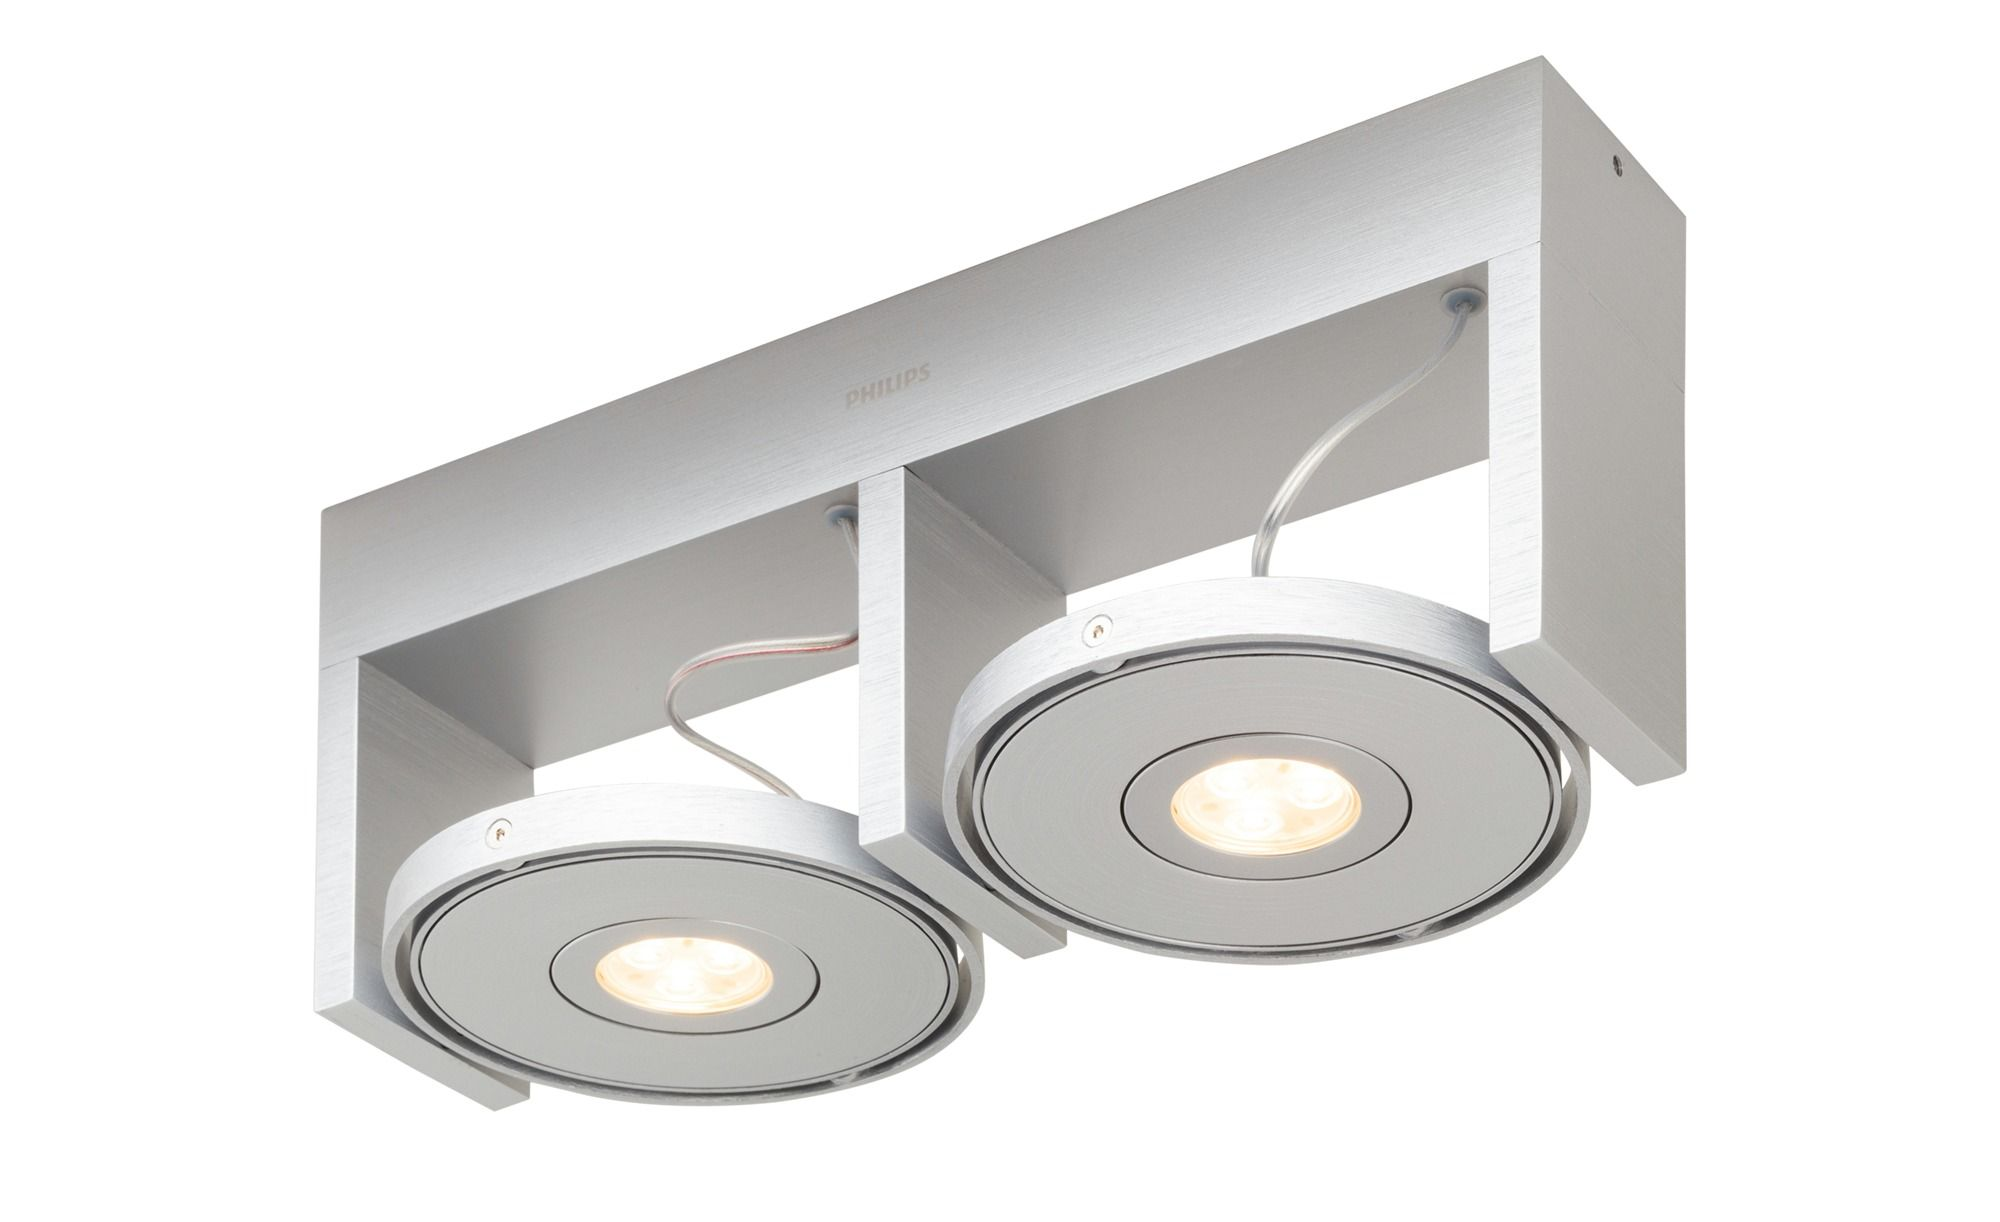 philips led deckenstrahler dreh und schwenkbar light. Black Bedroom Furniture Sets. Home Design Ideas